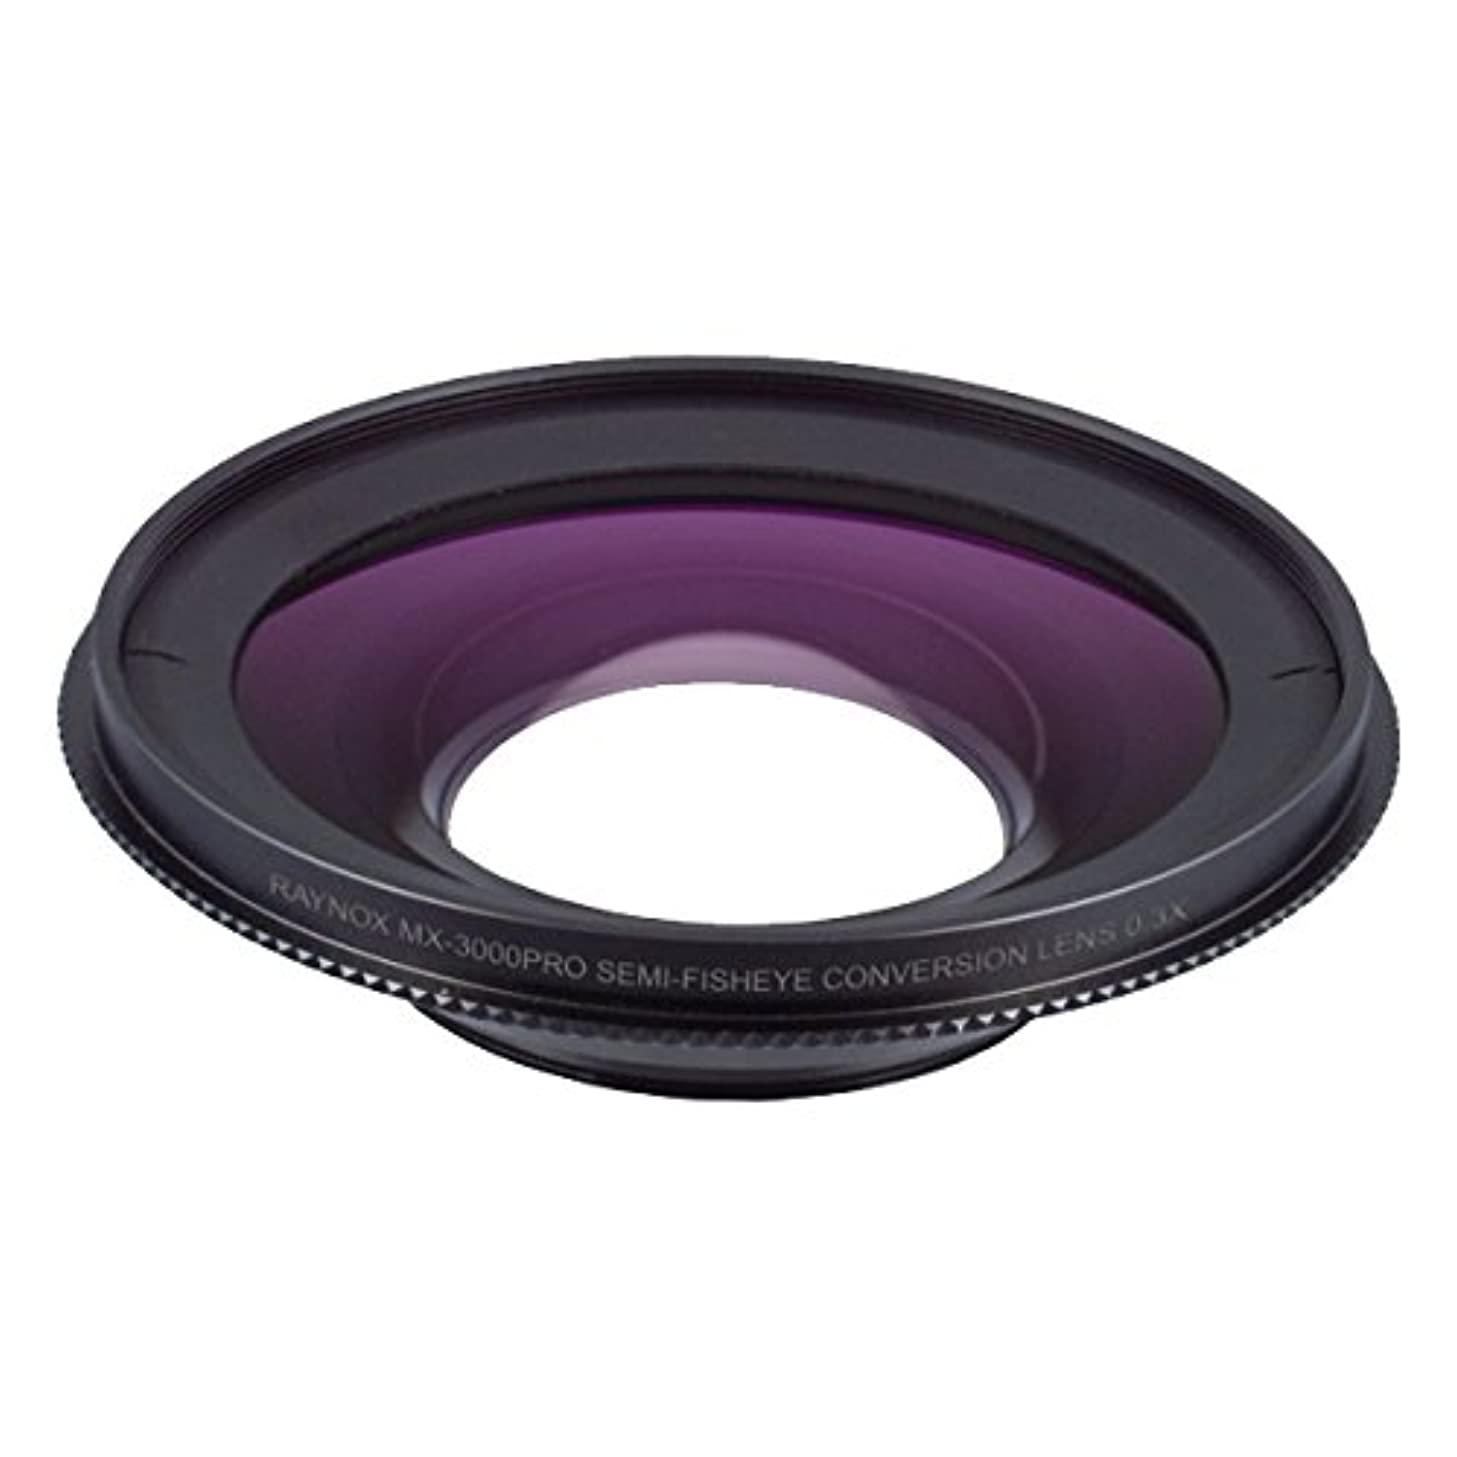 Raynox MX-3000PRO 0.3x Semi-Fisheye Ultra-Wide-angle Lens Attachment, Compatible with Canon XA20 Canon XA25